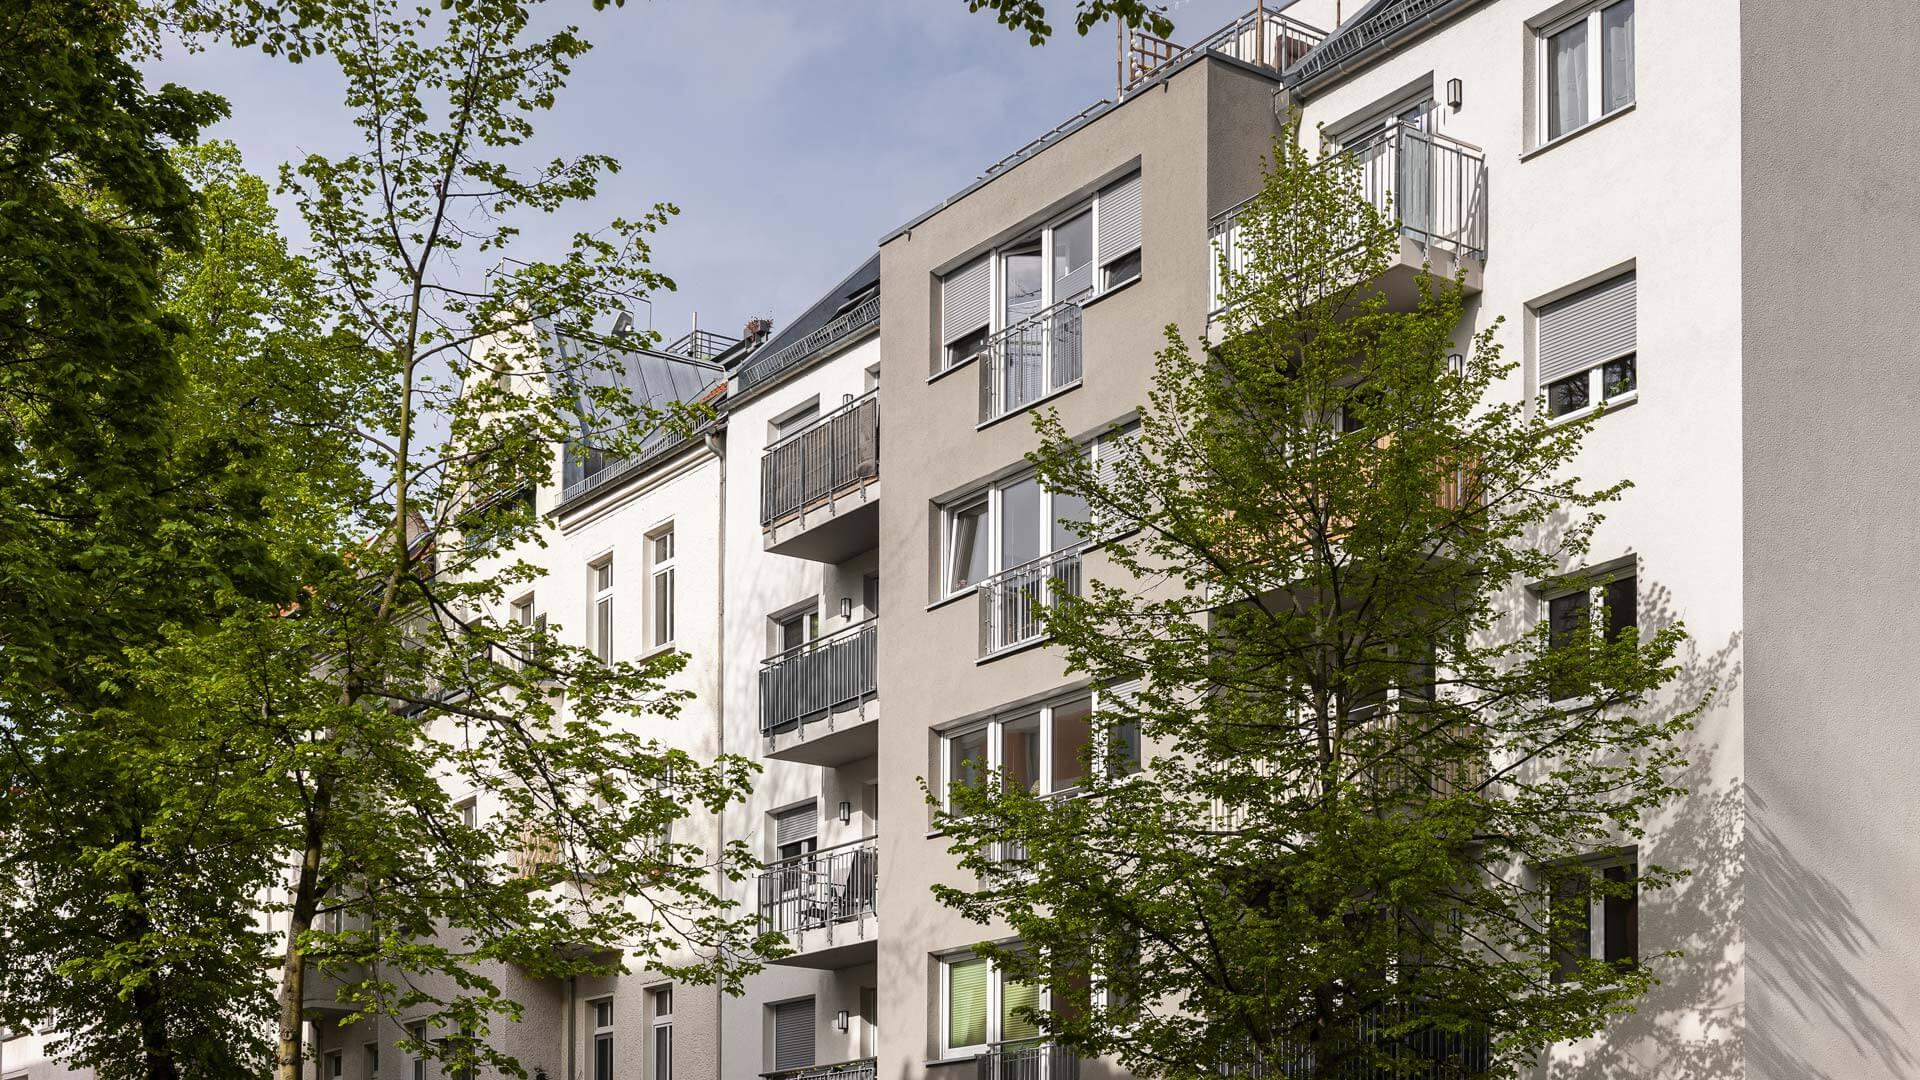 Neubau MFH Archenoldstrasse Berlin Pankow